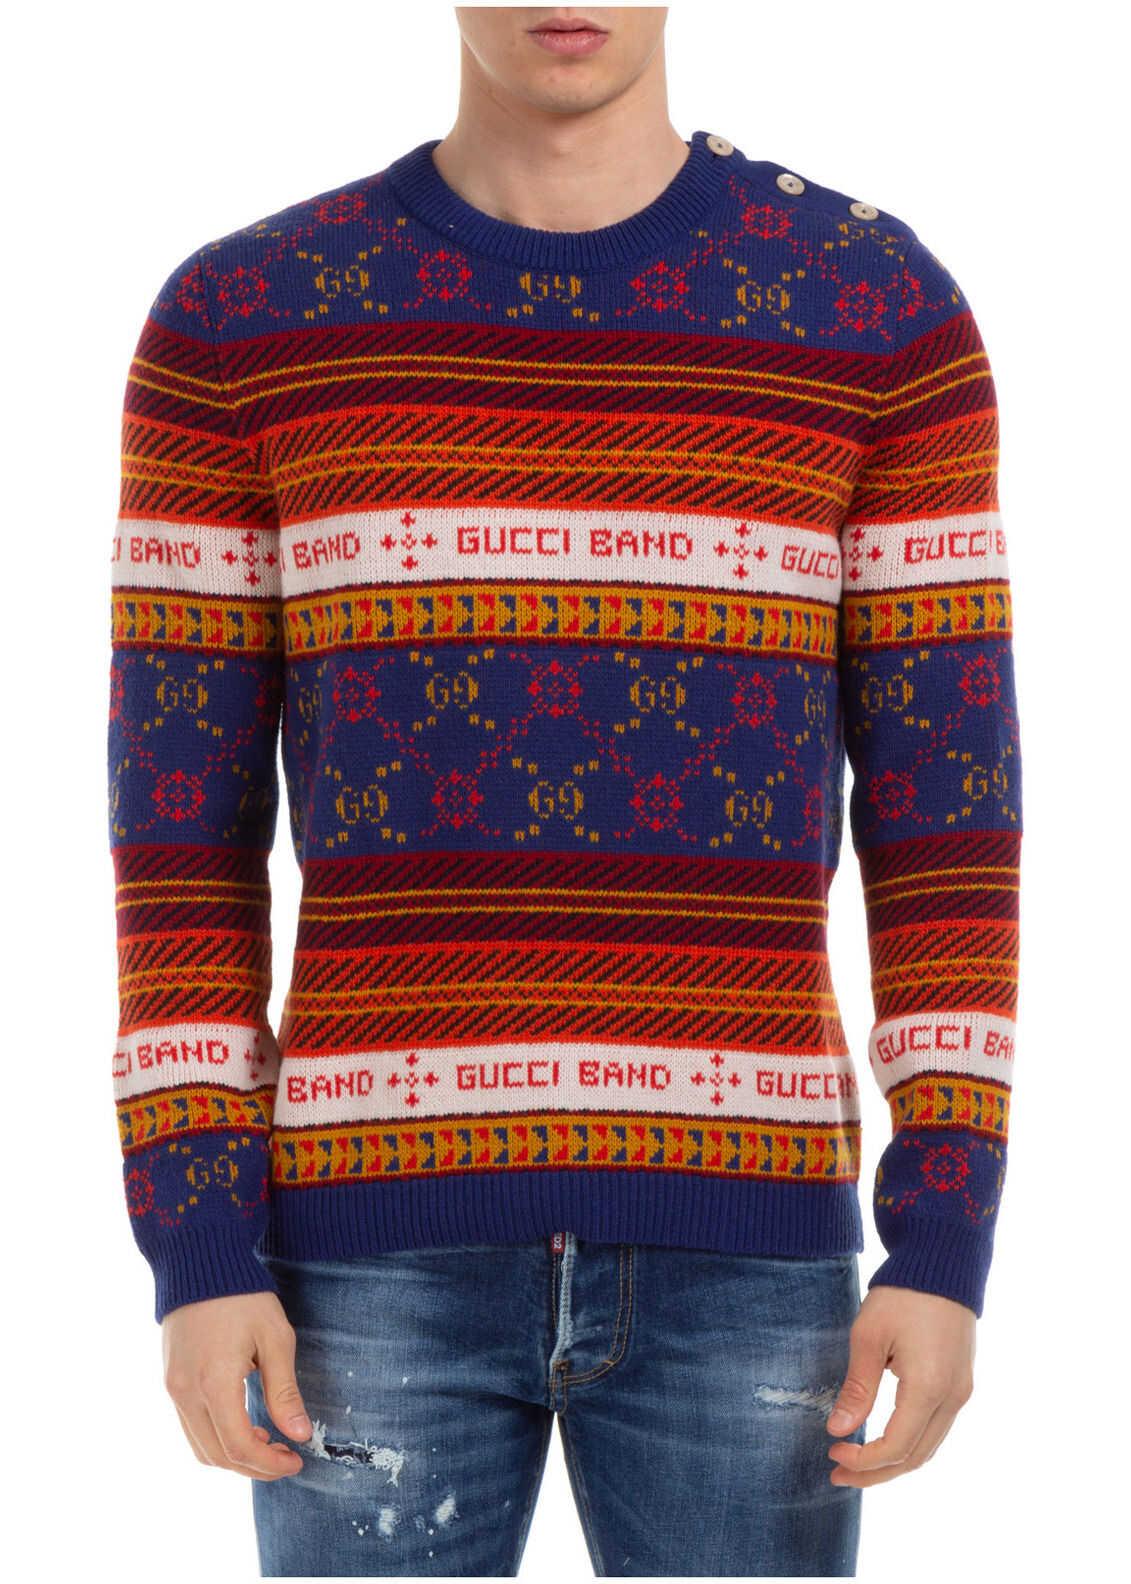 Gucci Sweater Pullover Blue